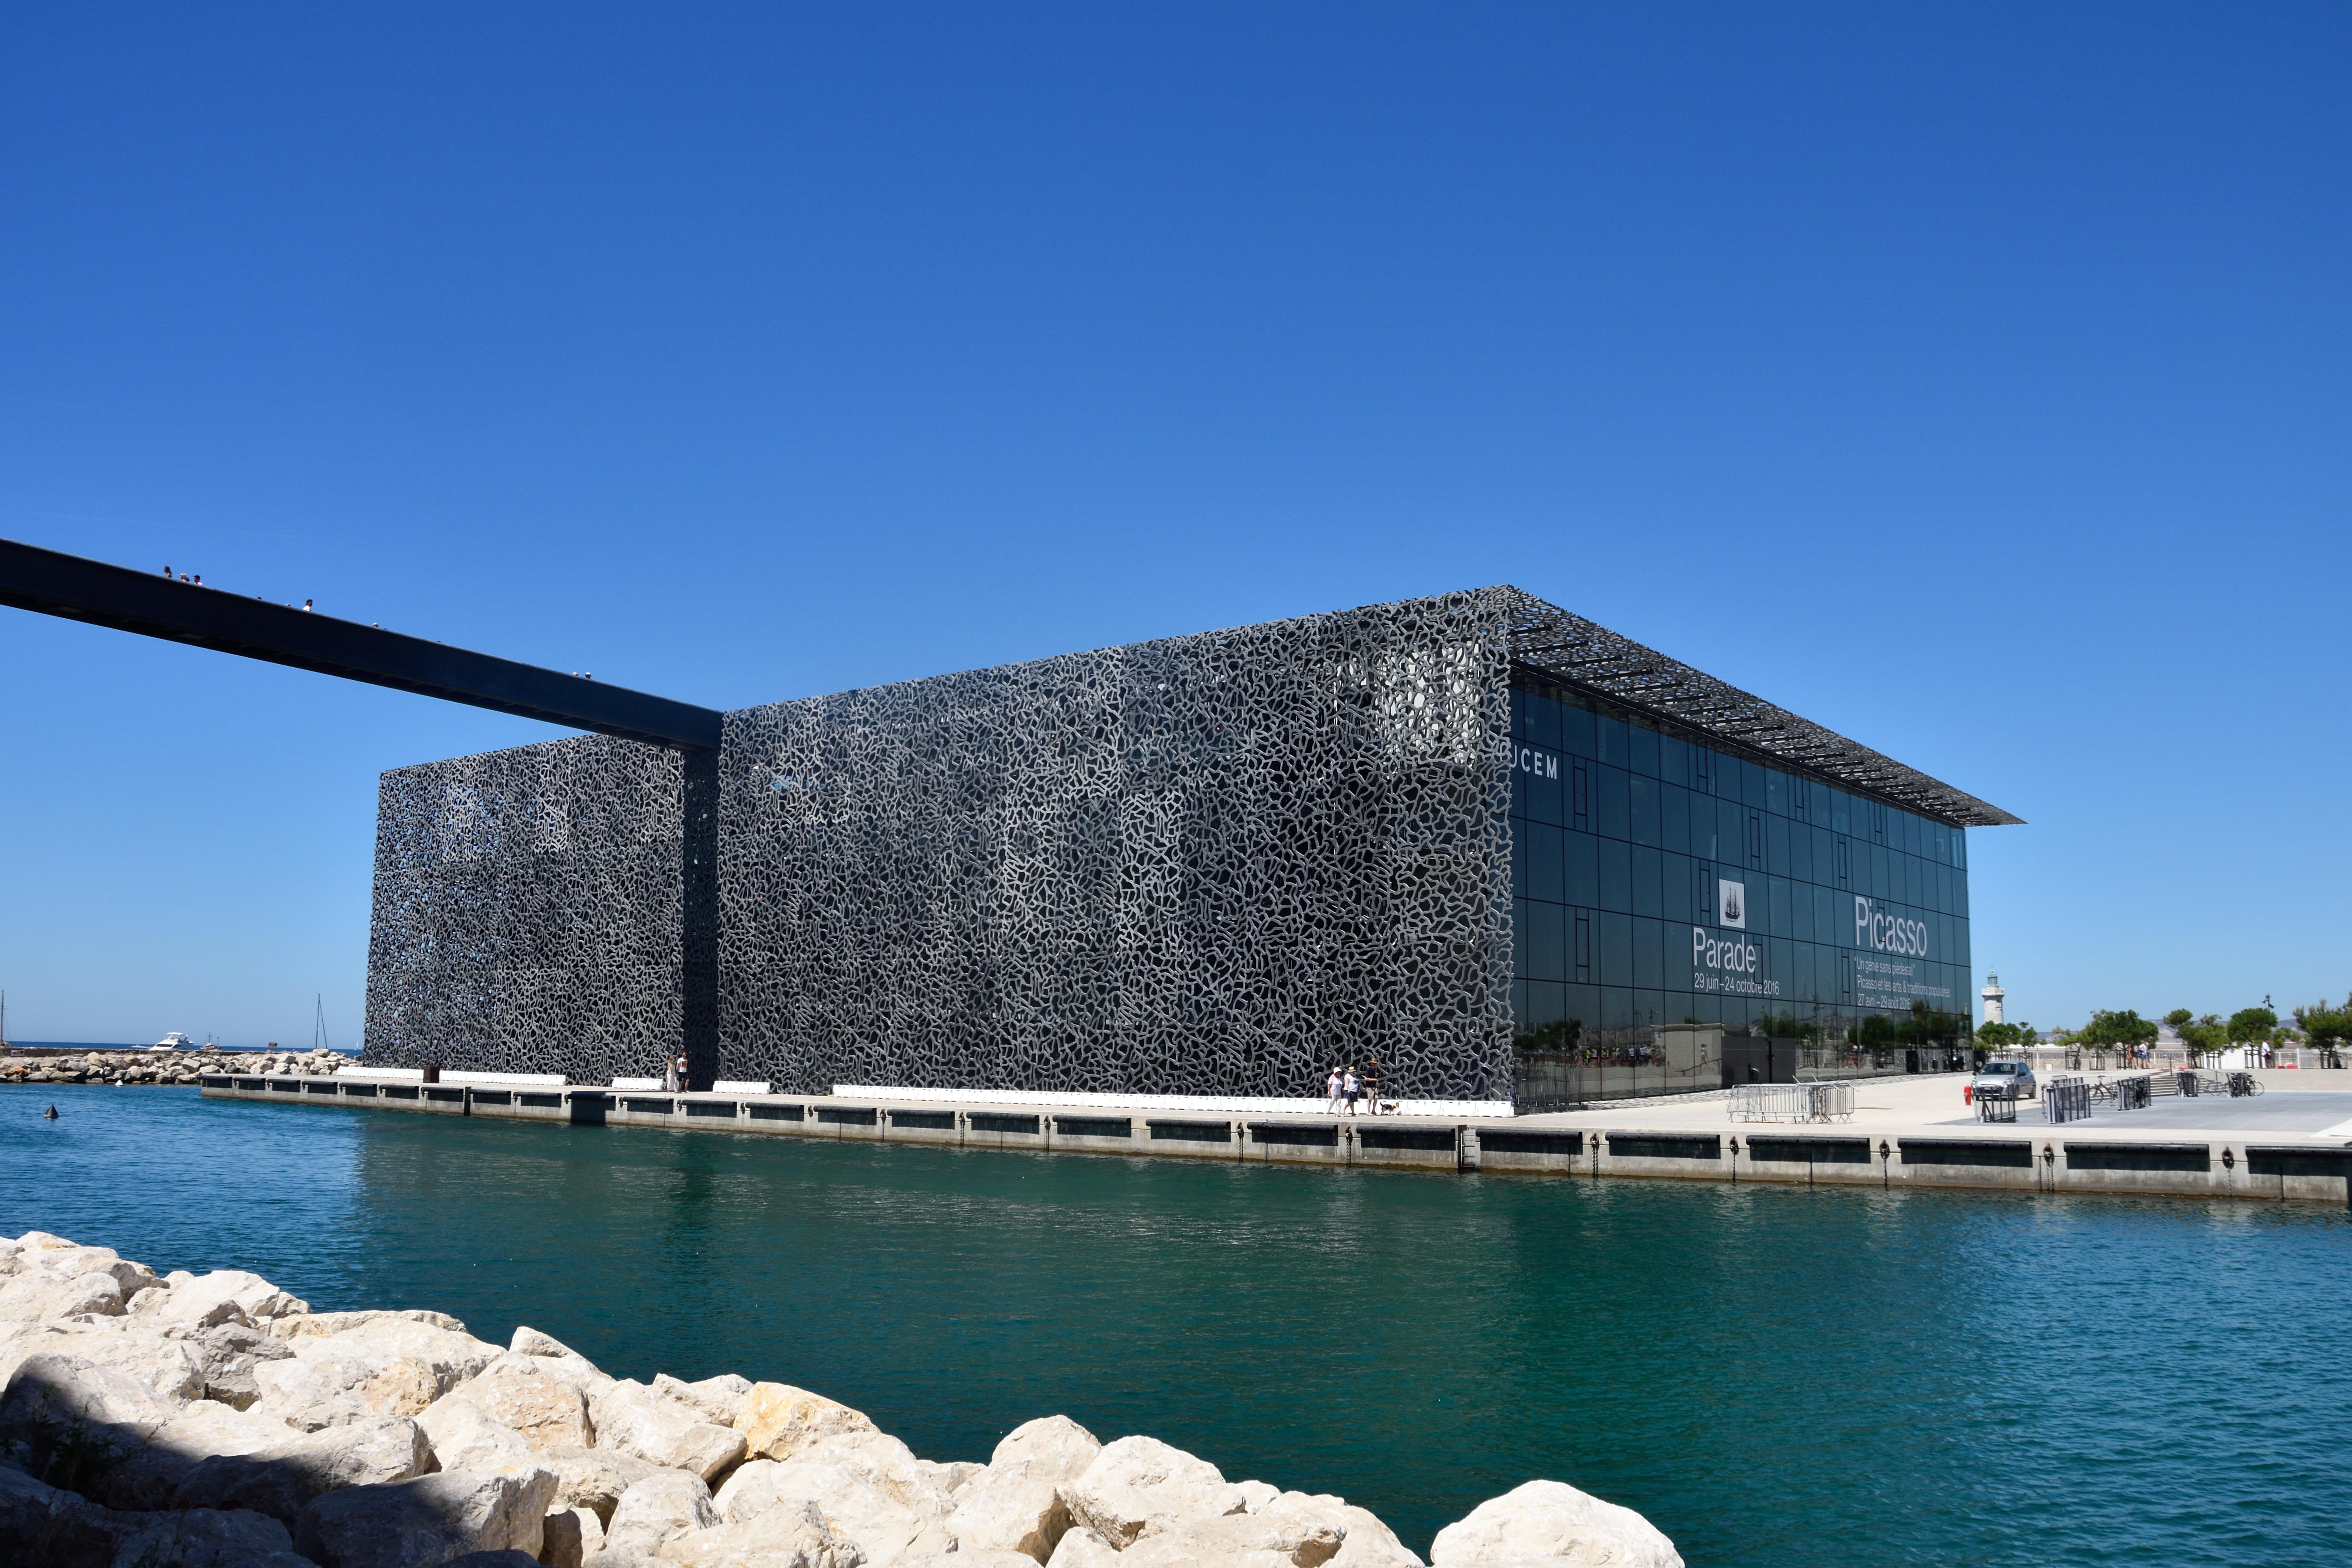 free images sea france mediterranean museum landmark modern architecture marseille. Black Bedroom Furniture Sets. Home Design Ideas